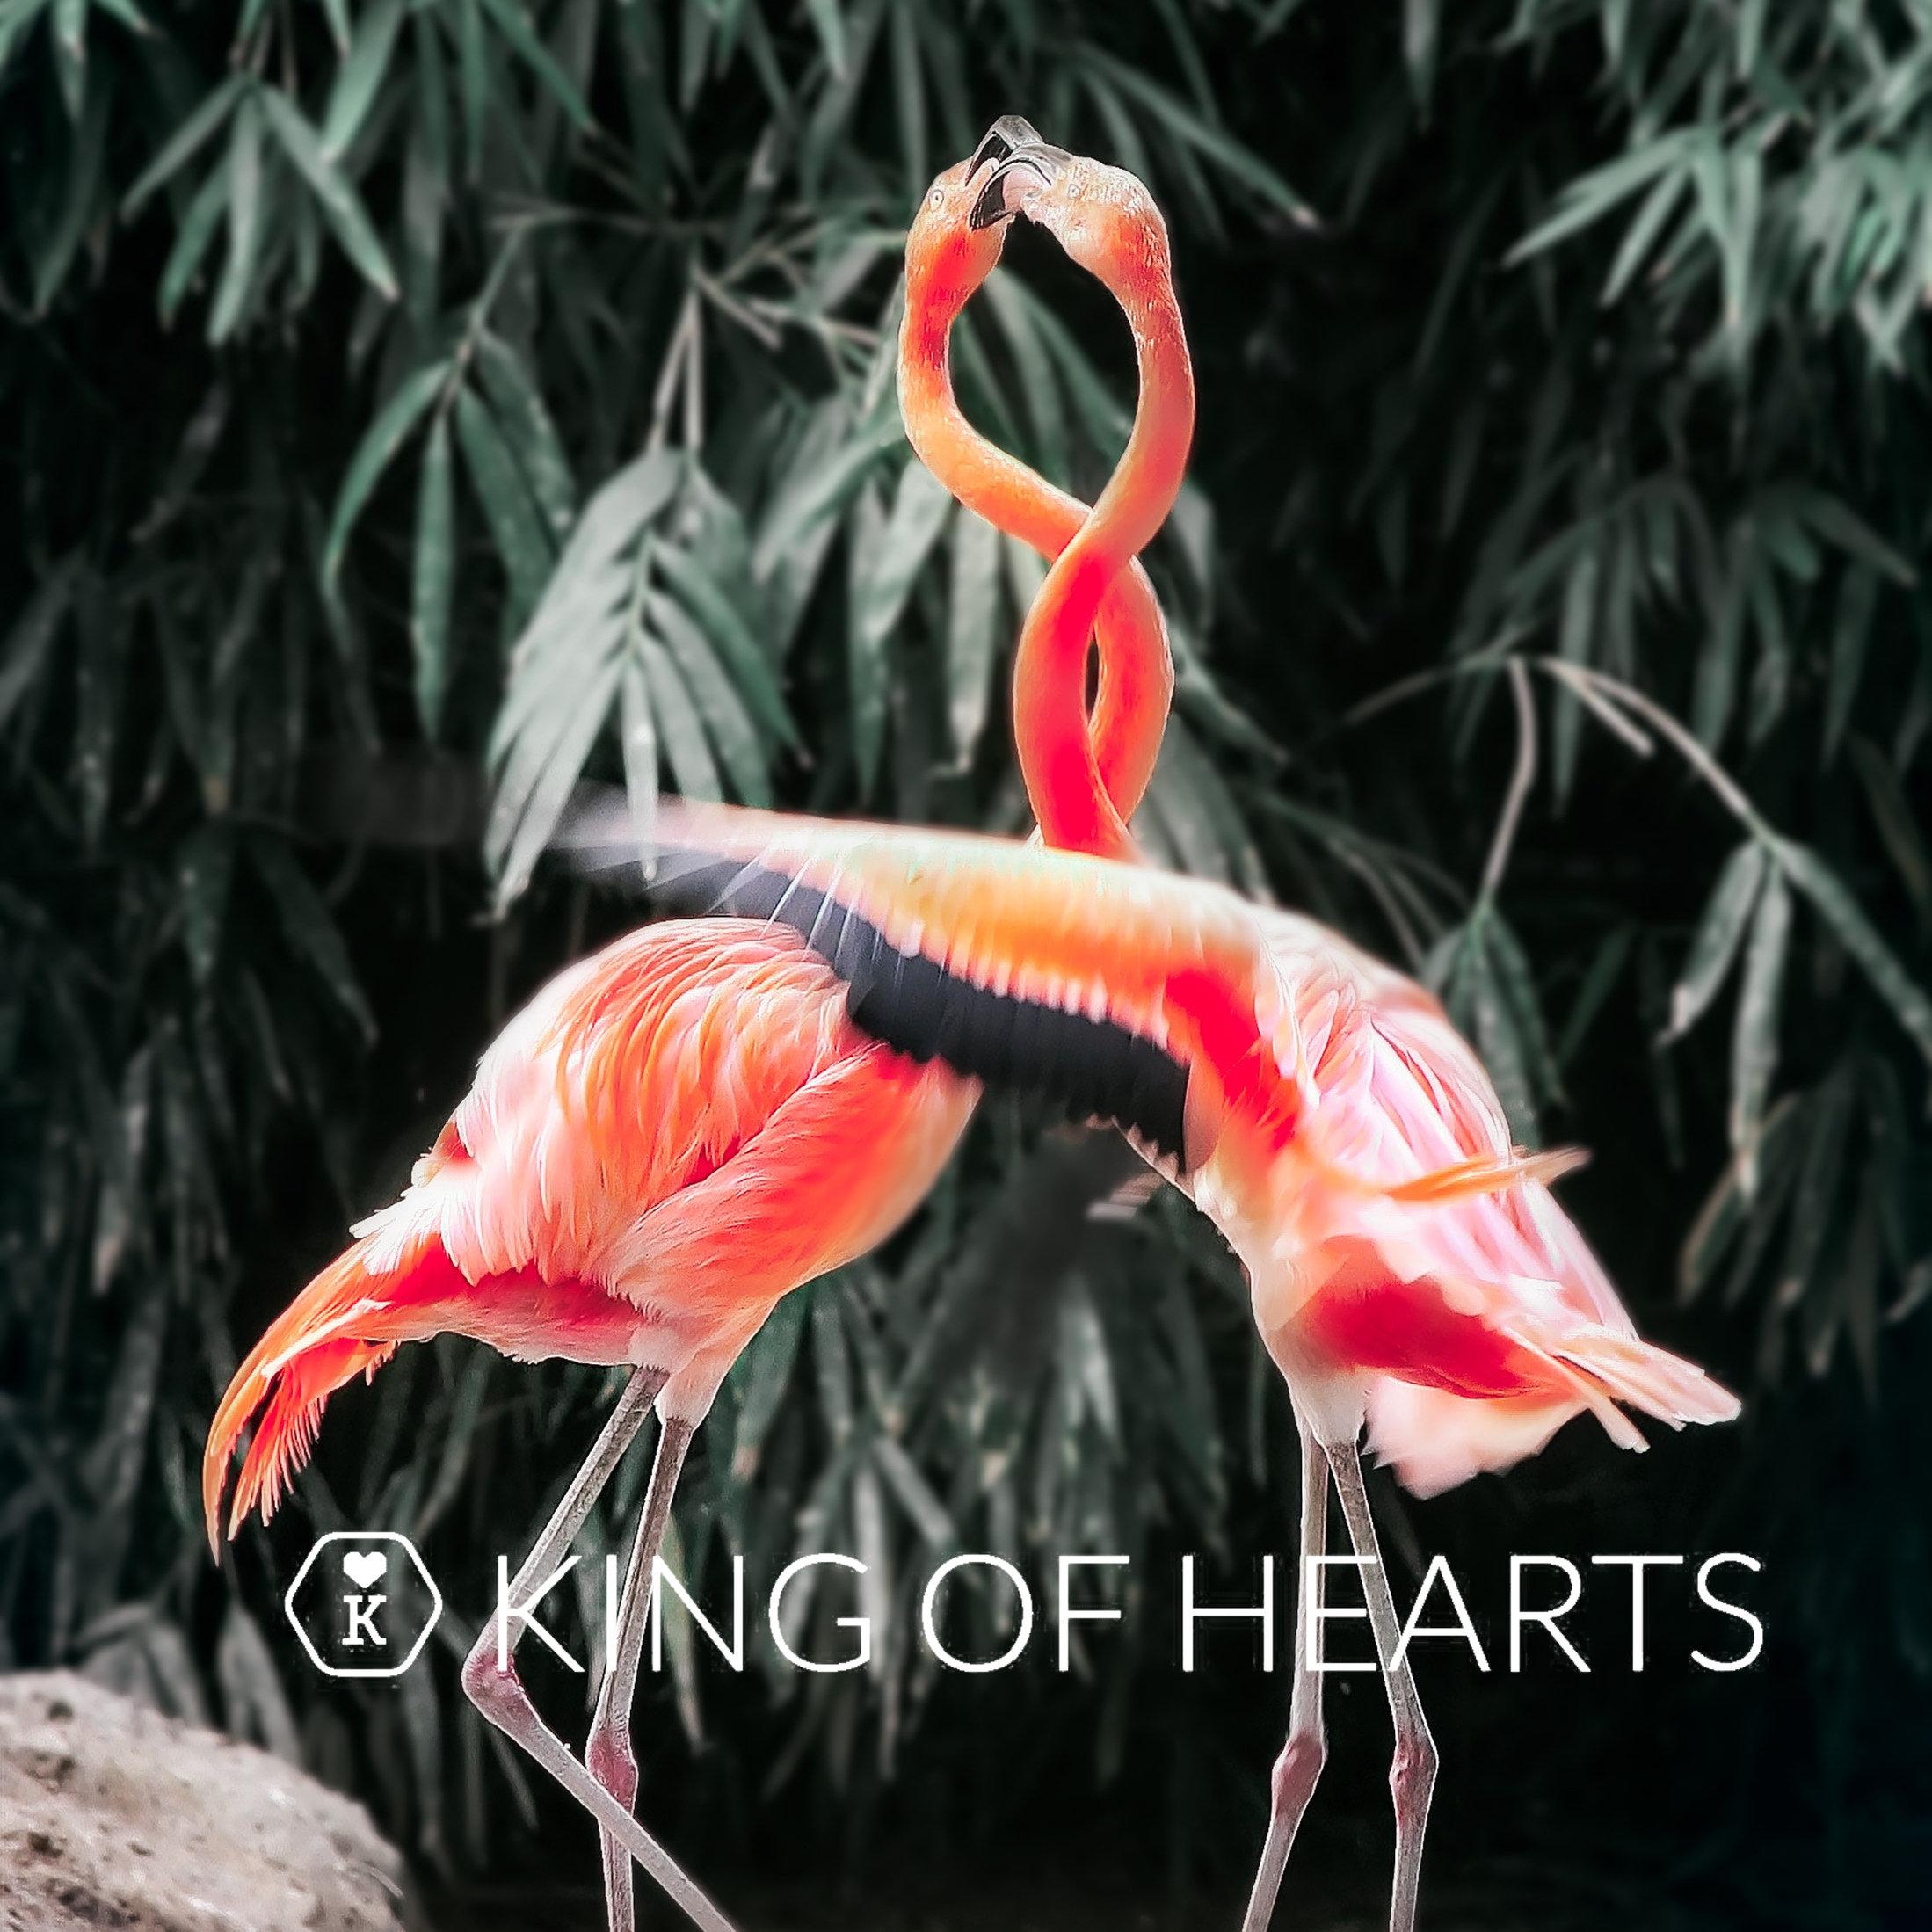 Webshop in mannen-accessoires-flamingo-tuesday-jpg